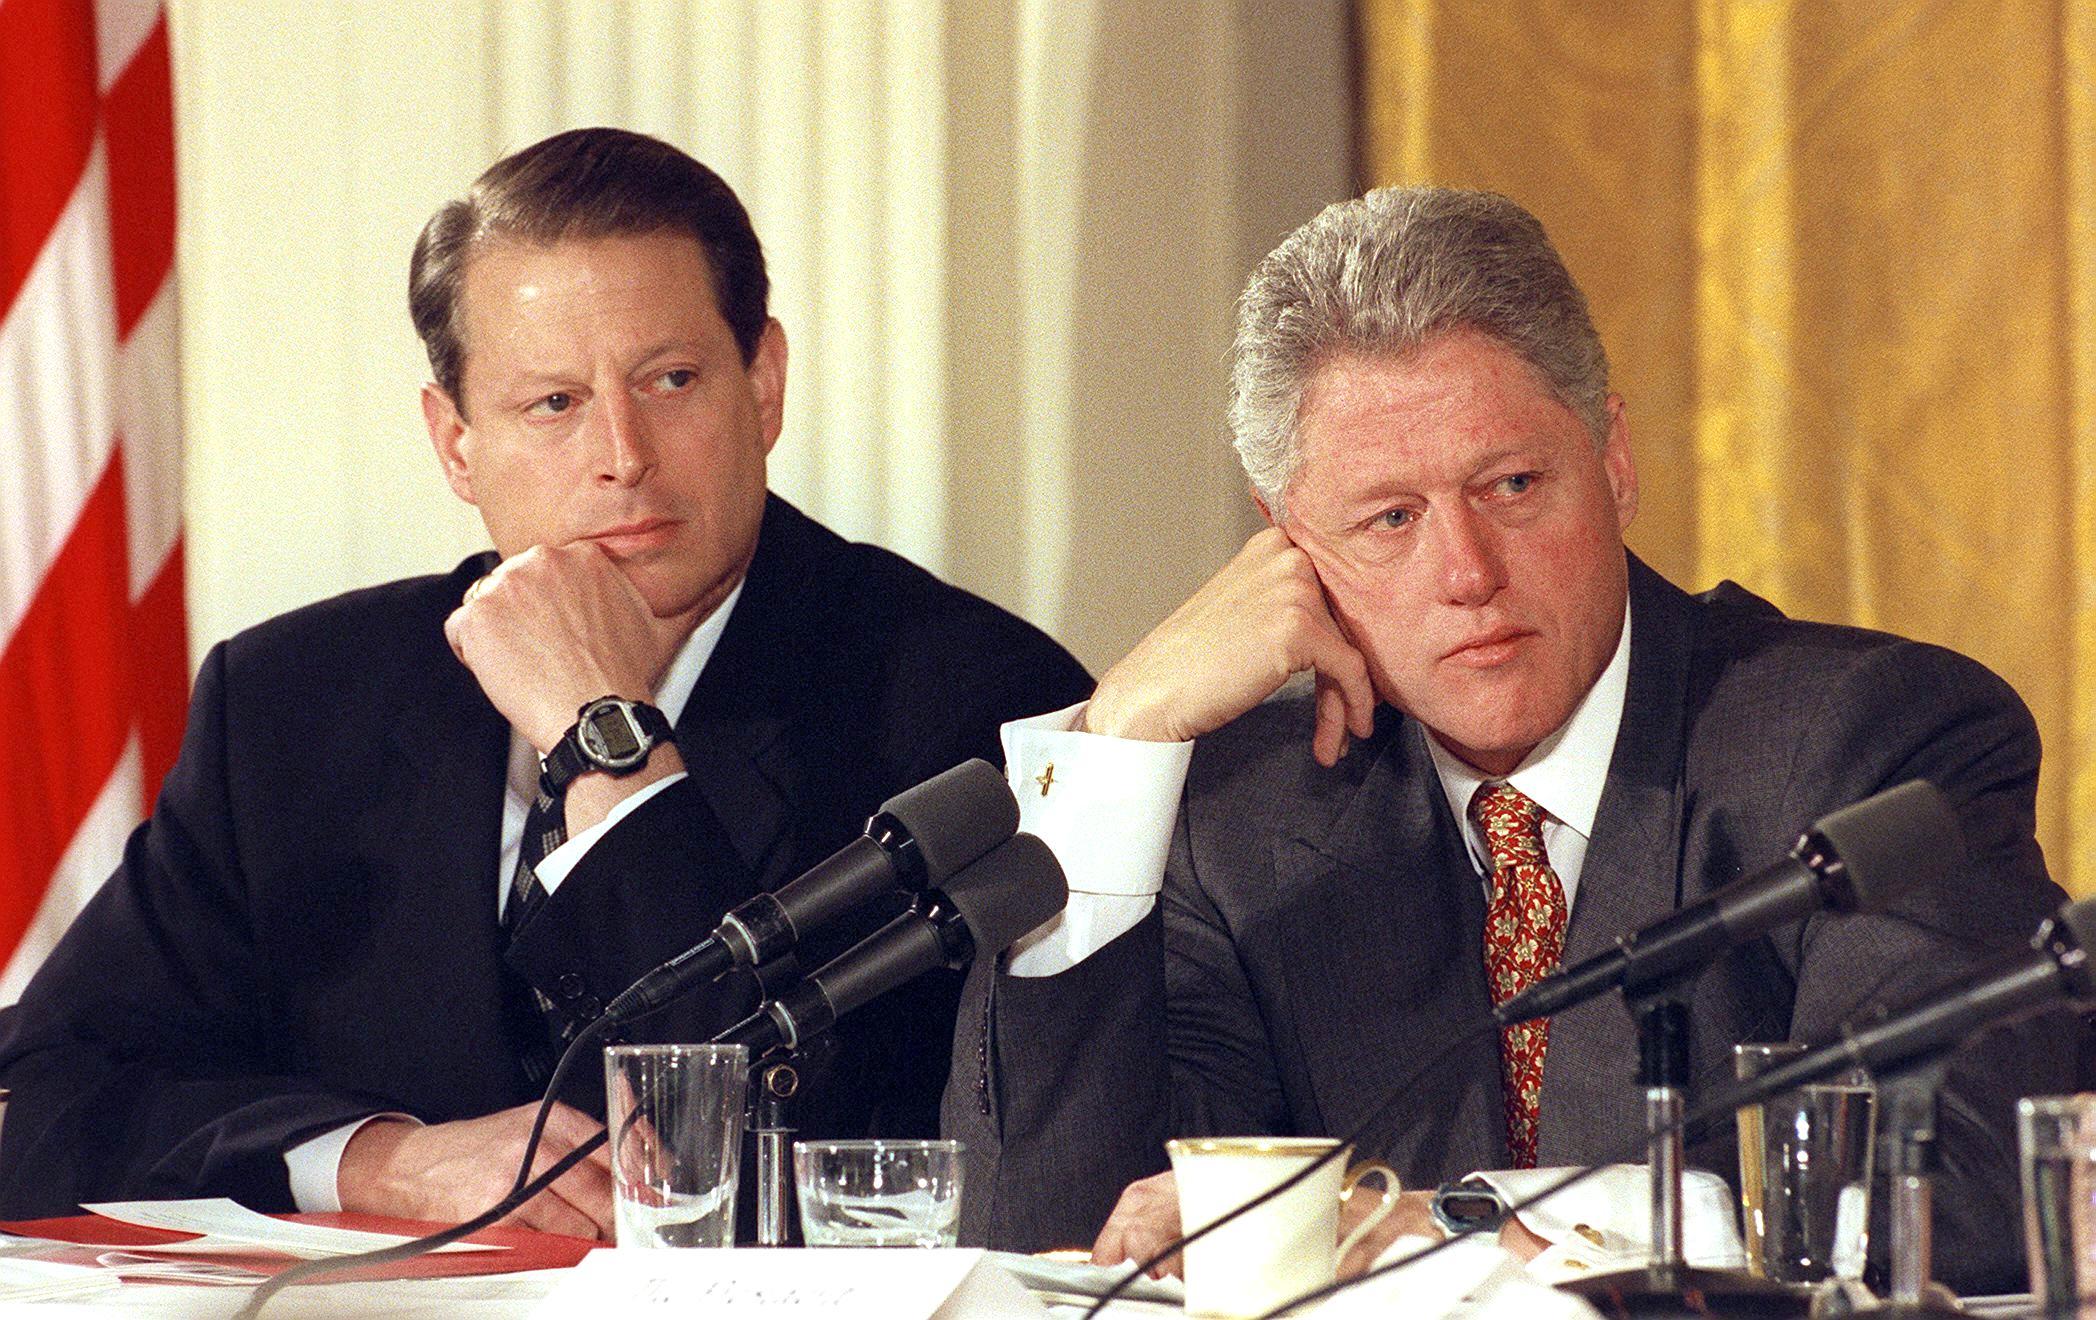 US President Bill Clinton and Vice President Al Gore